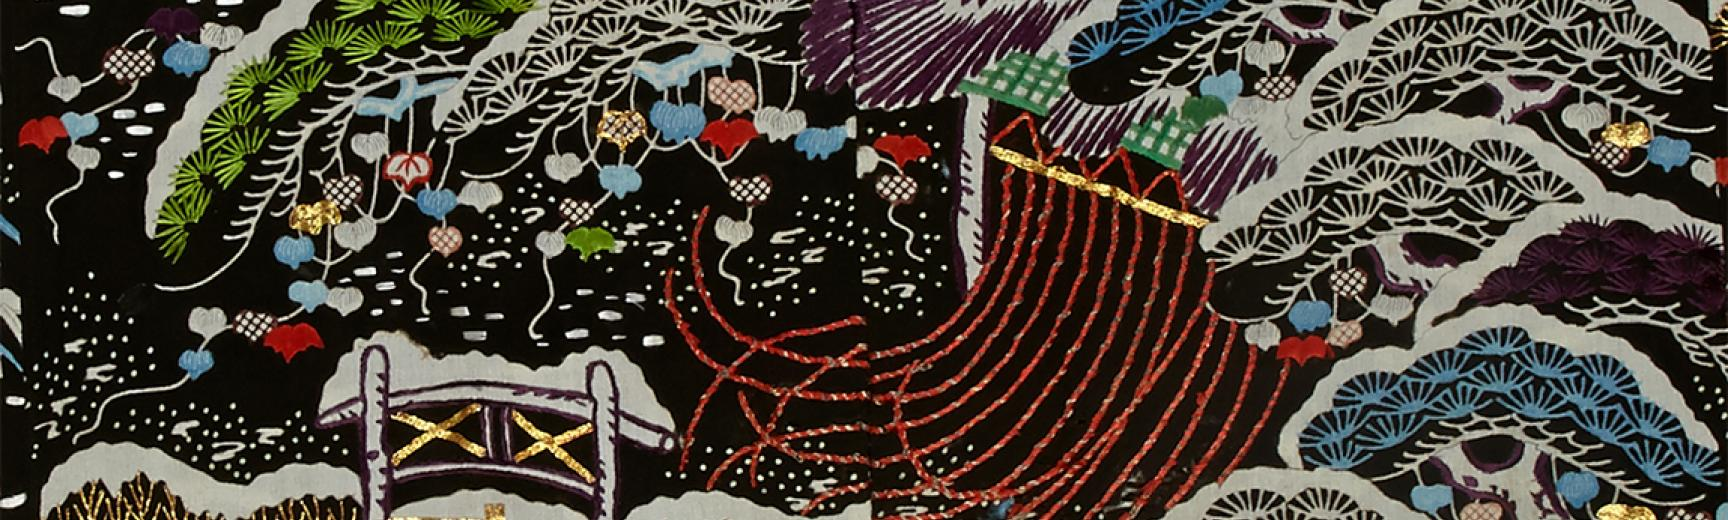 EA1957.85 Kimono with design of snowy pines